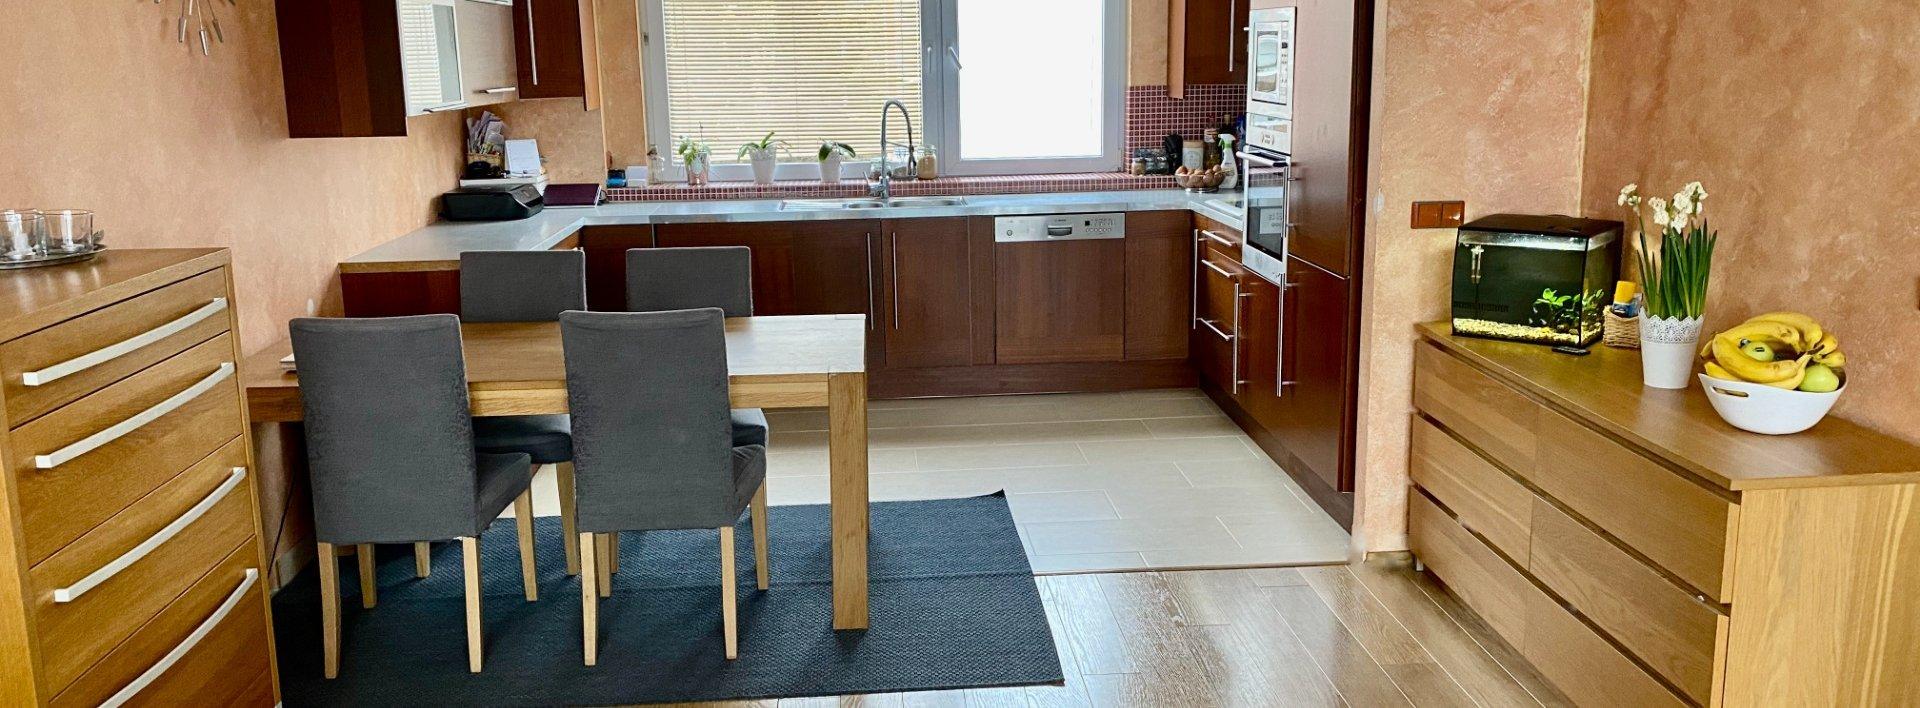 Prodej atypického bytu 3+kk, 72 m² - Jablonec n/N, Mšeno, Ev.č.: N49354